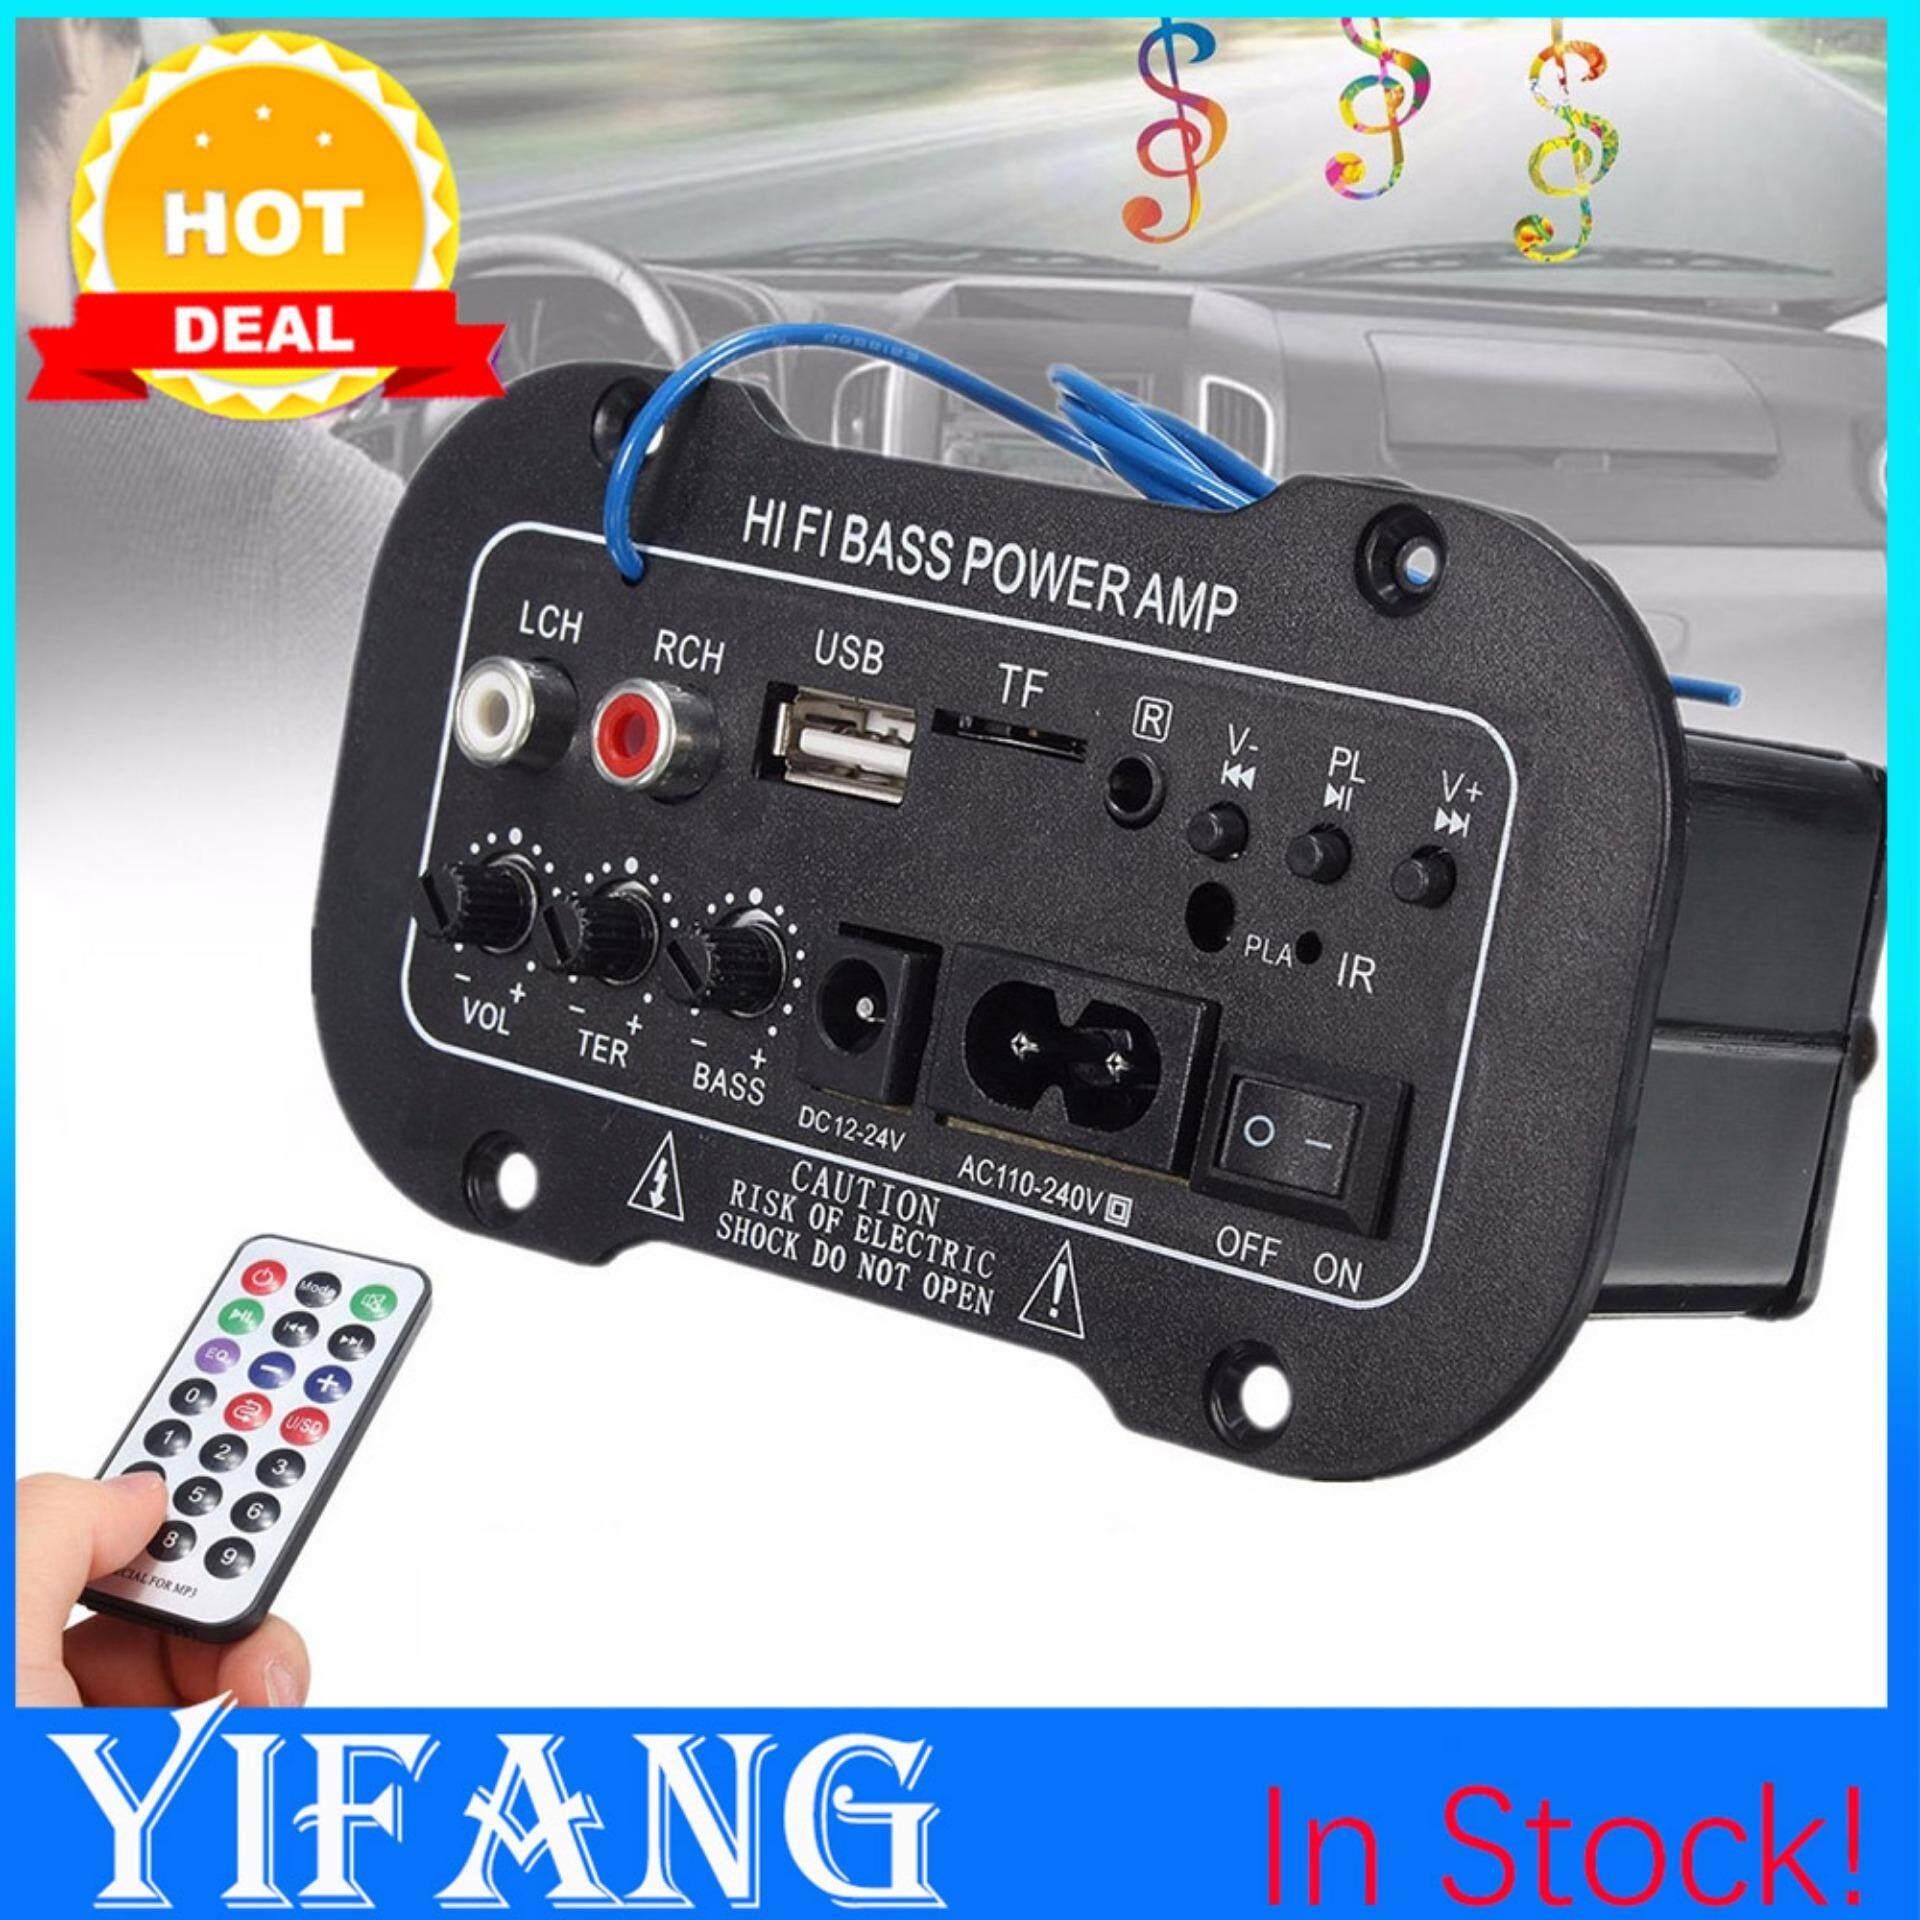 Yifang - รถบลูทูธไฮไฟ Bass เพาเวอร์แอมป์สเตอริโอ 220 โวลต์เครื่องขยายเสียงดิจิตอล Usb Tf ระยะไกลสำหรับรถบ้านอุปกรณ์เสริม By Yifang.